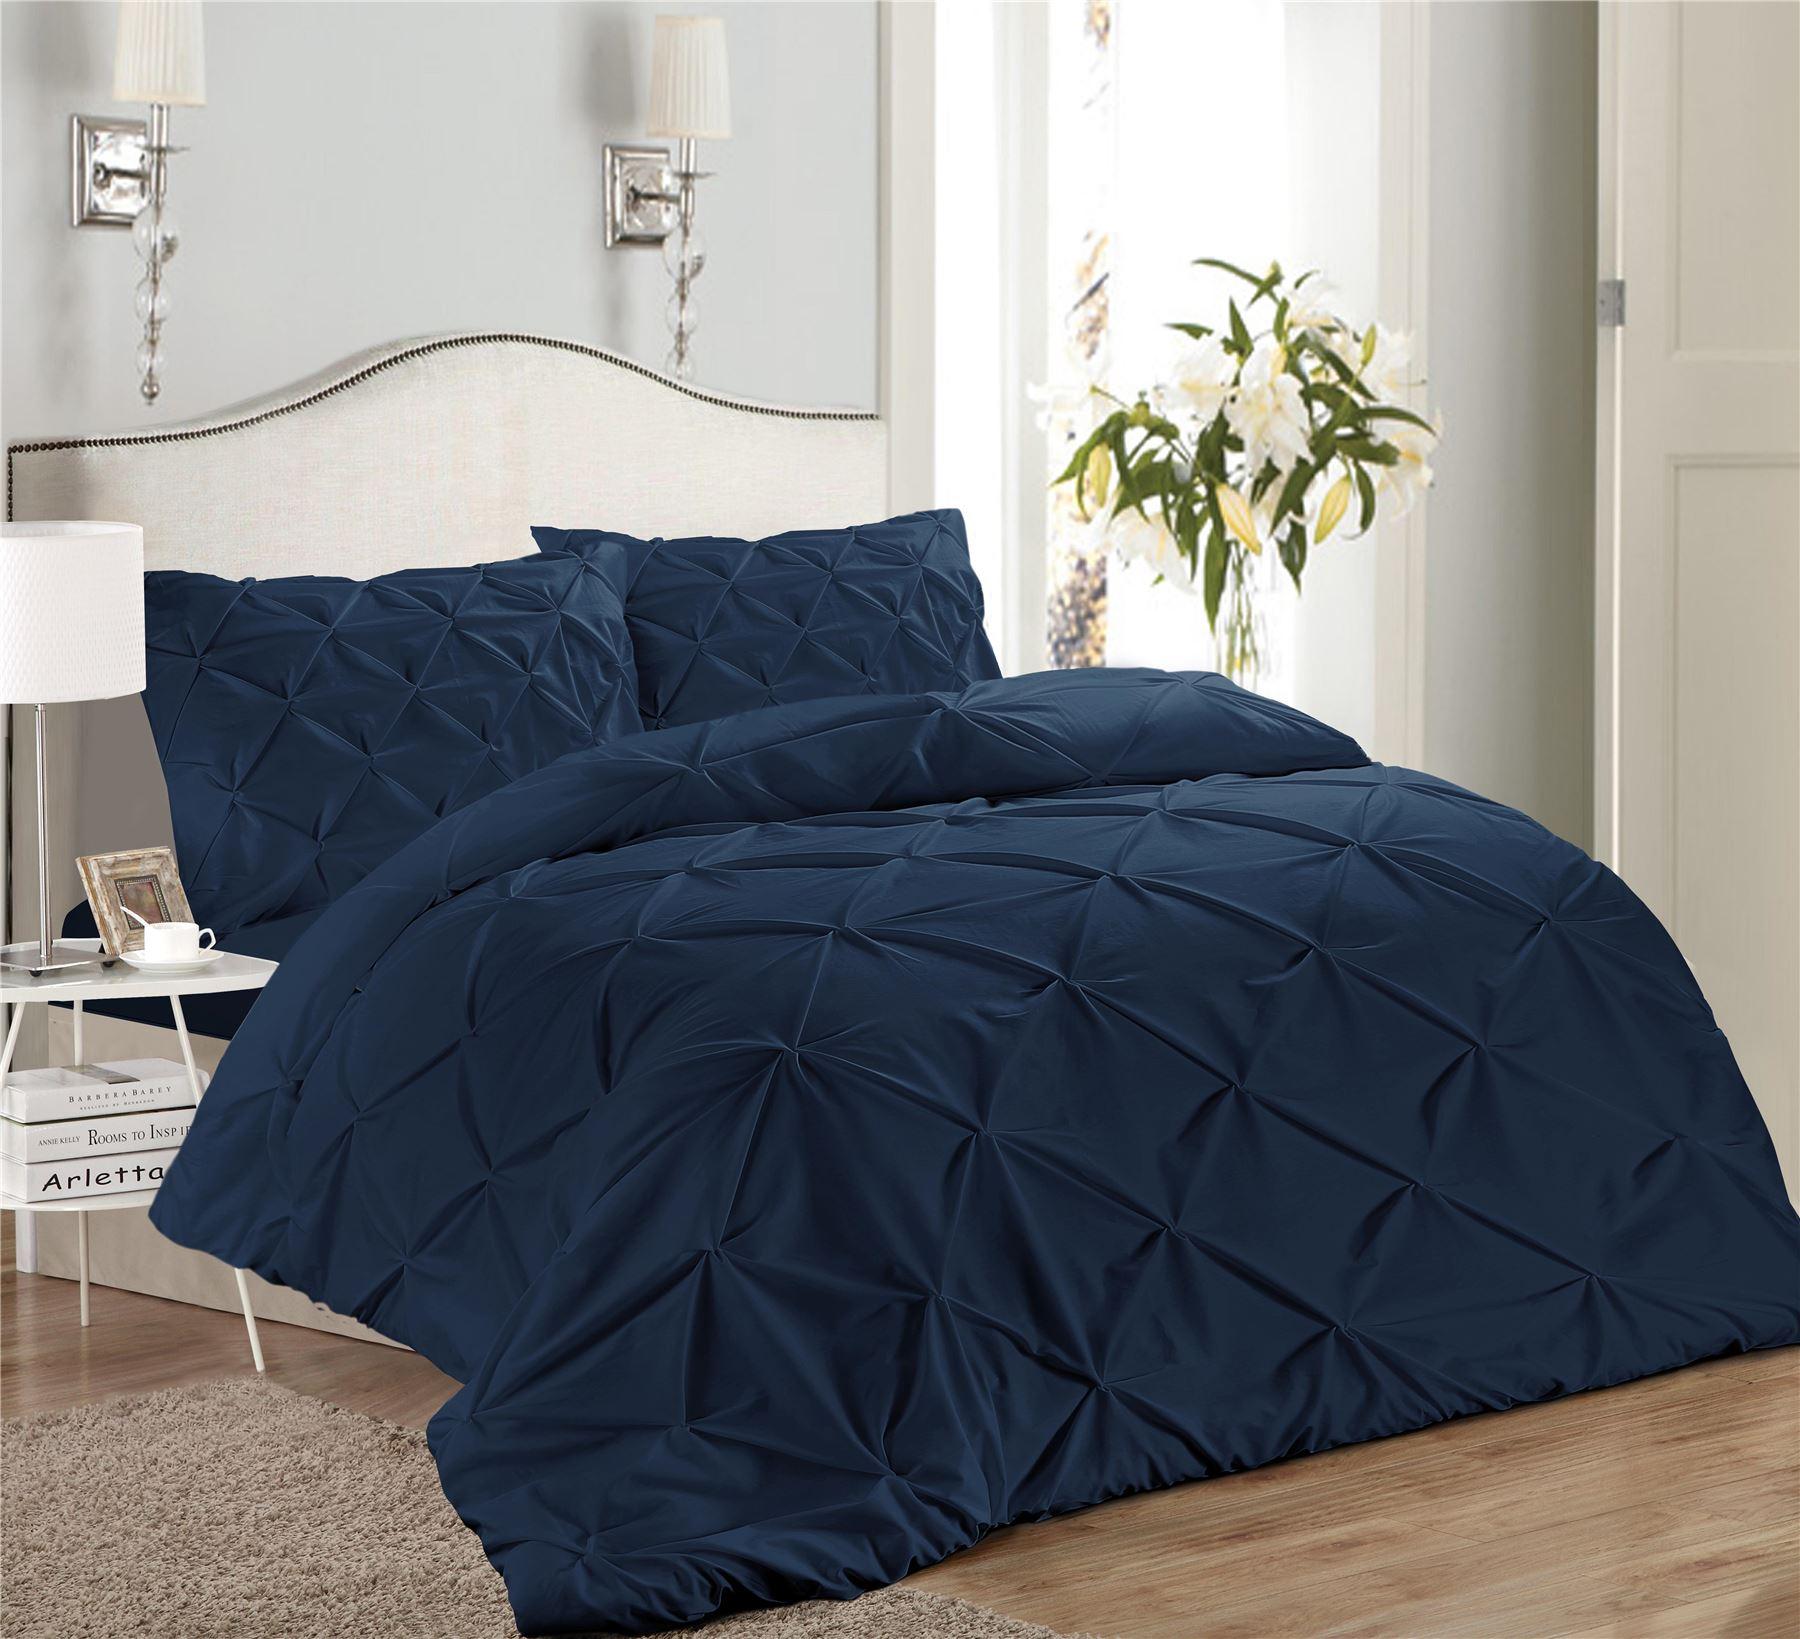 Luxury-Pure-100-Cotton-200-Thread-Pinch-Pleat-Pintuck-Puckering-Duvet-Cover-Set thumbnail 20